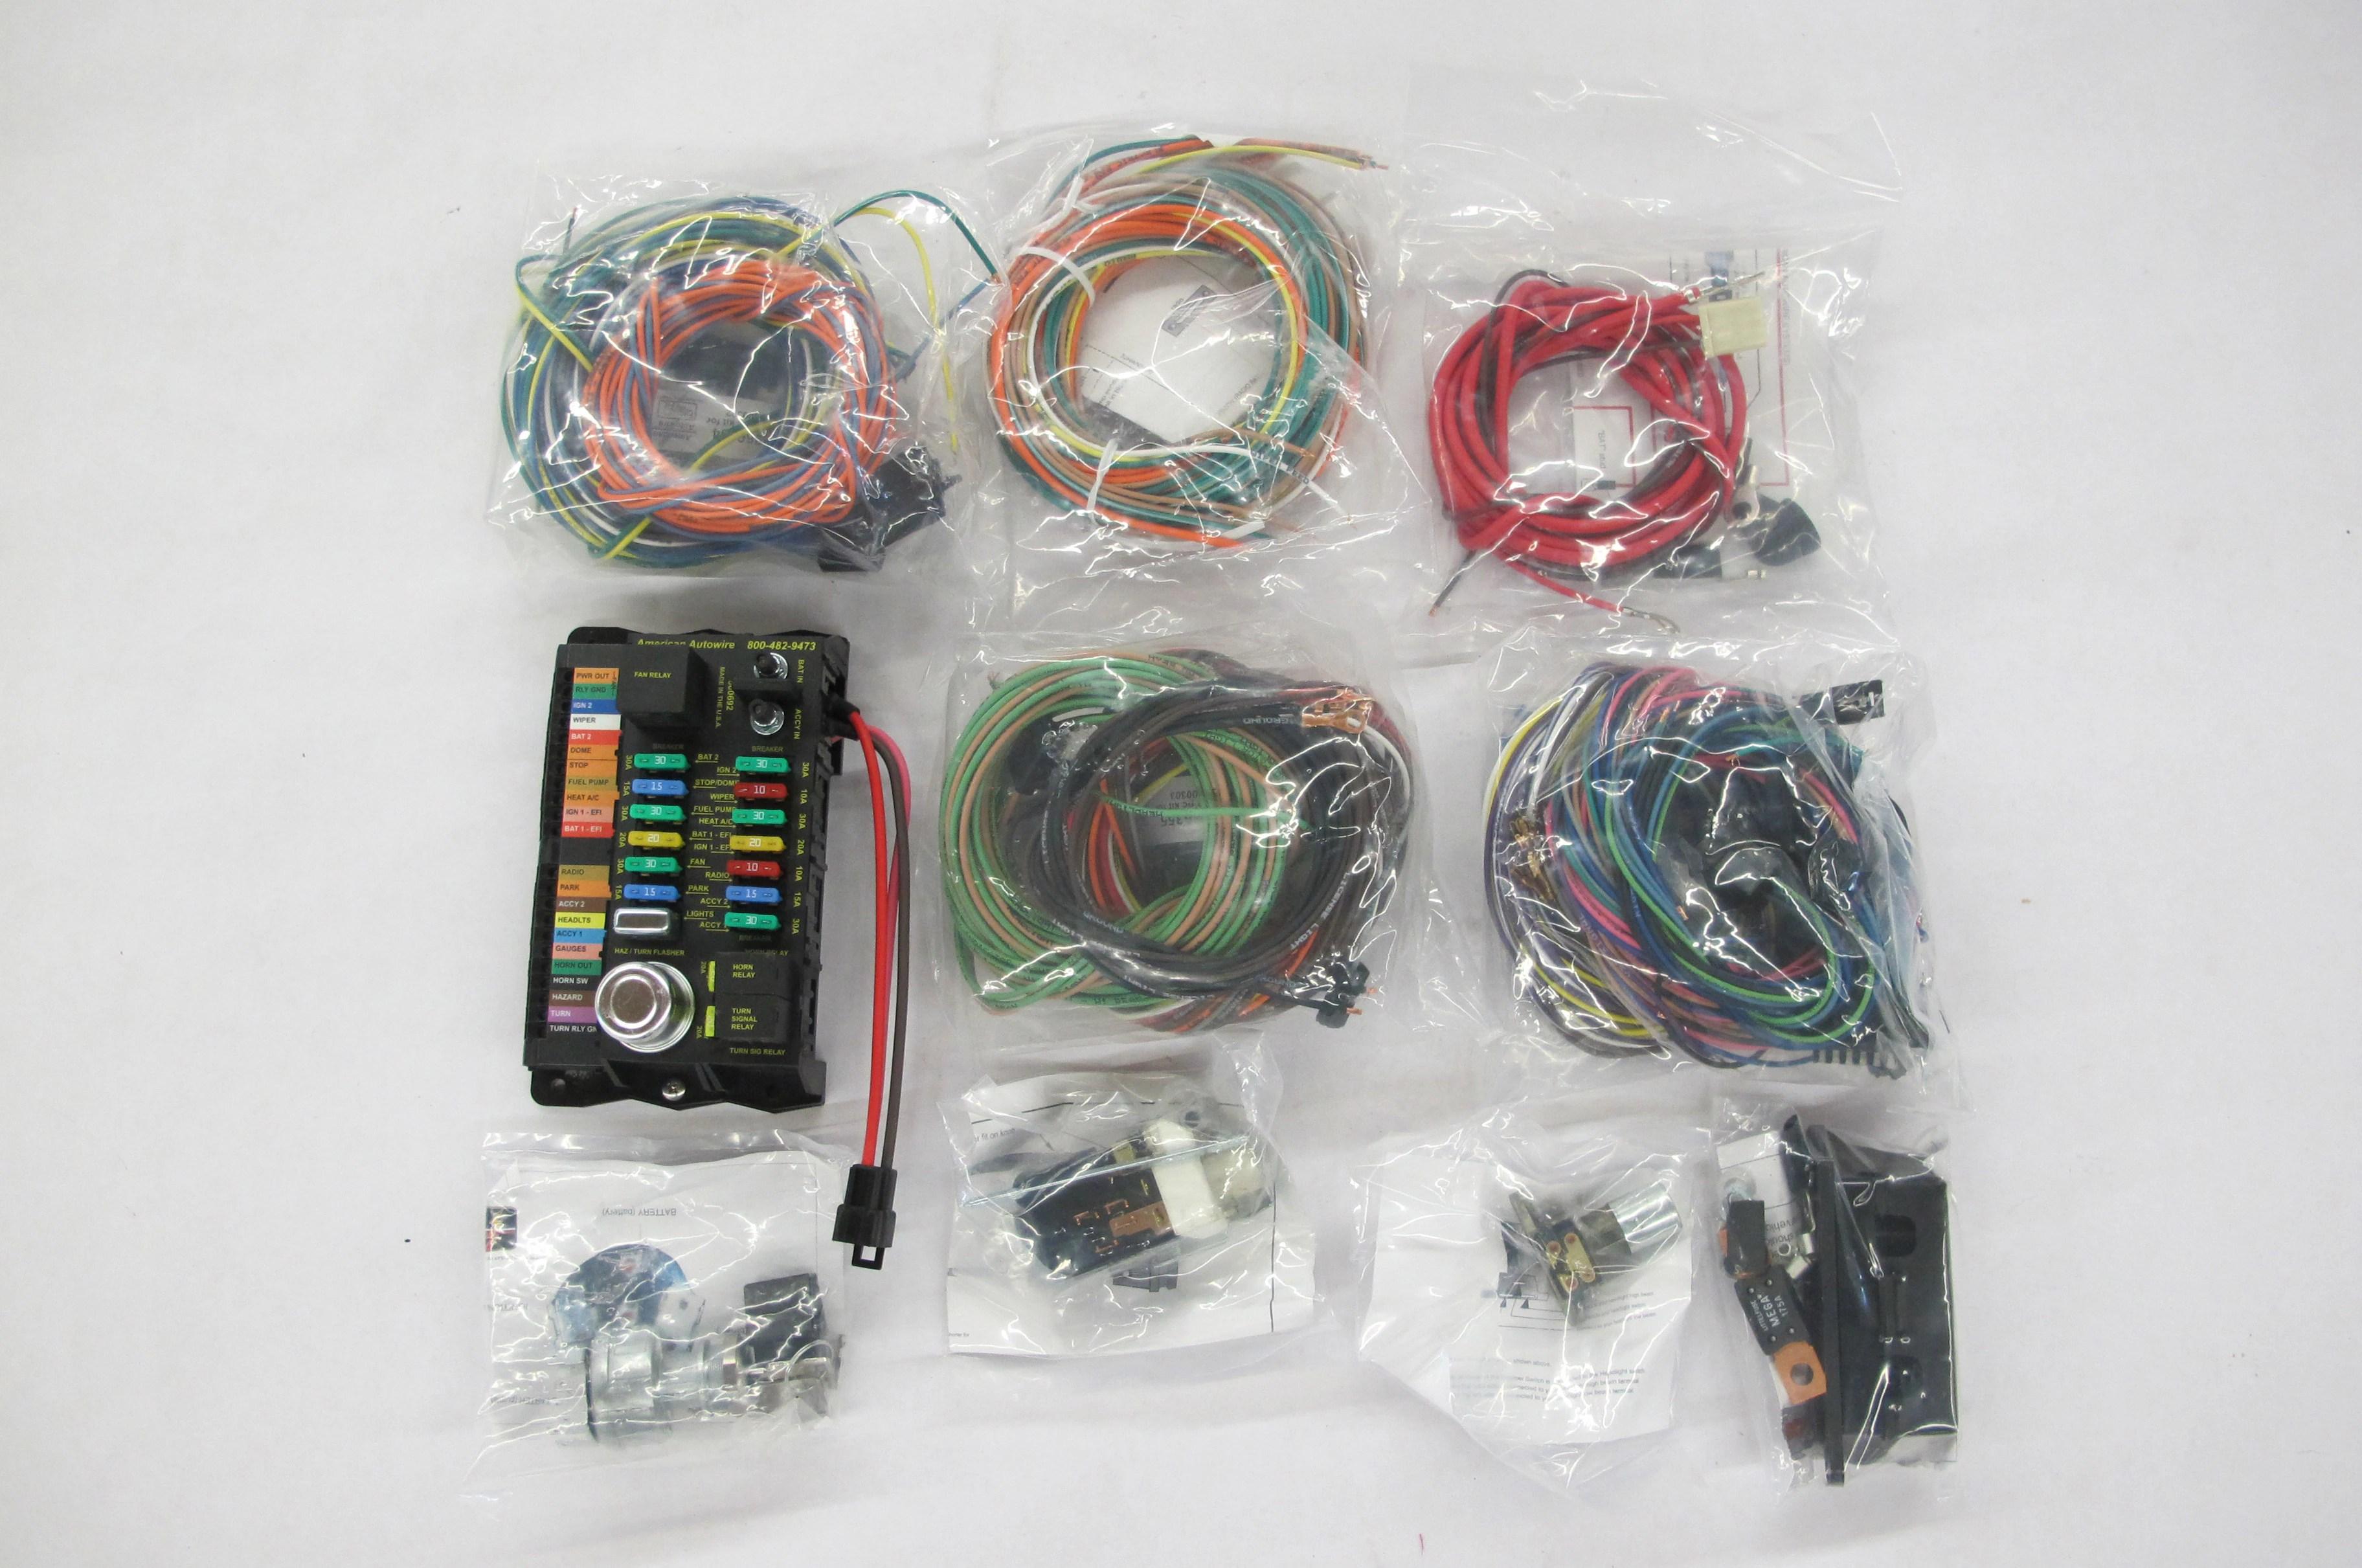 hight resolution of power plus series custom street rod wiring harness kits american power plus series custom street rod wiring harness kits american